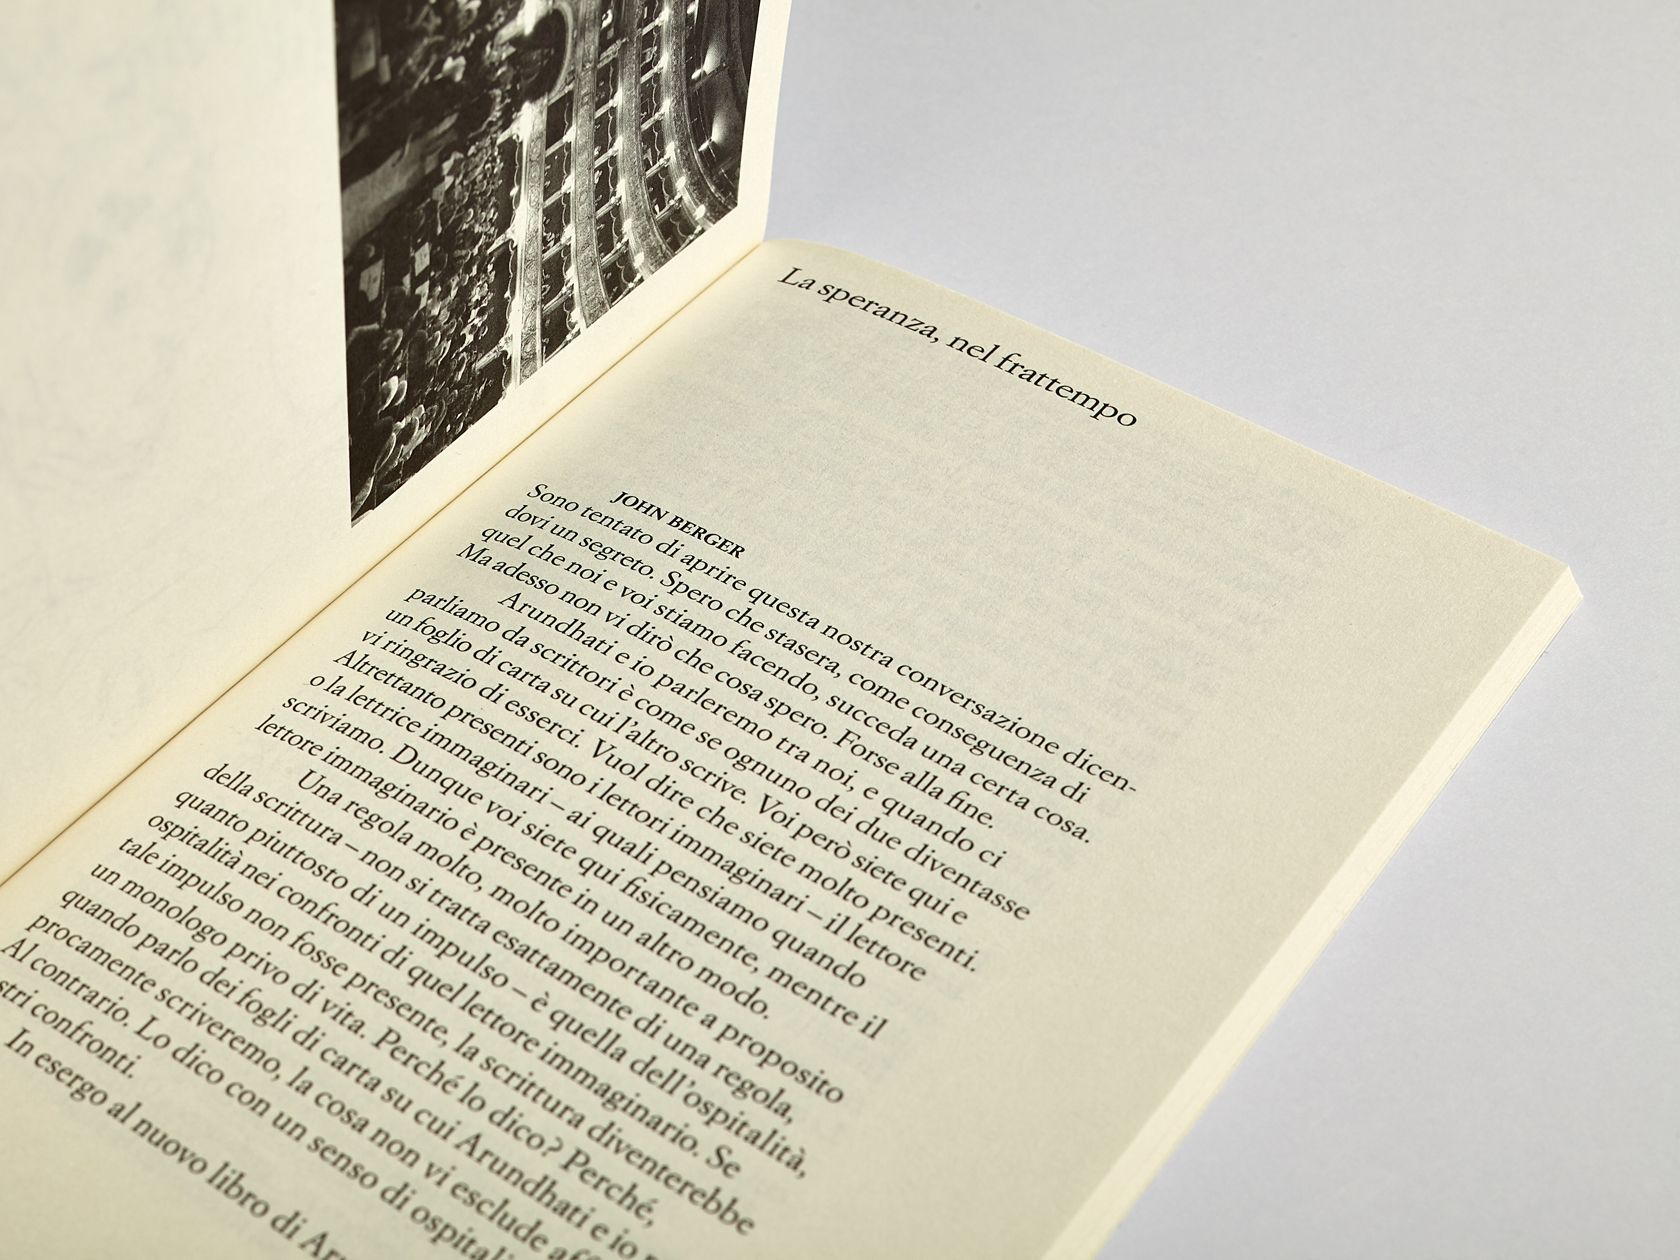 http://www.ccrz.ch/?297/edizioni-casagrande-alfabeti-collection